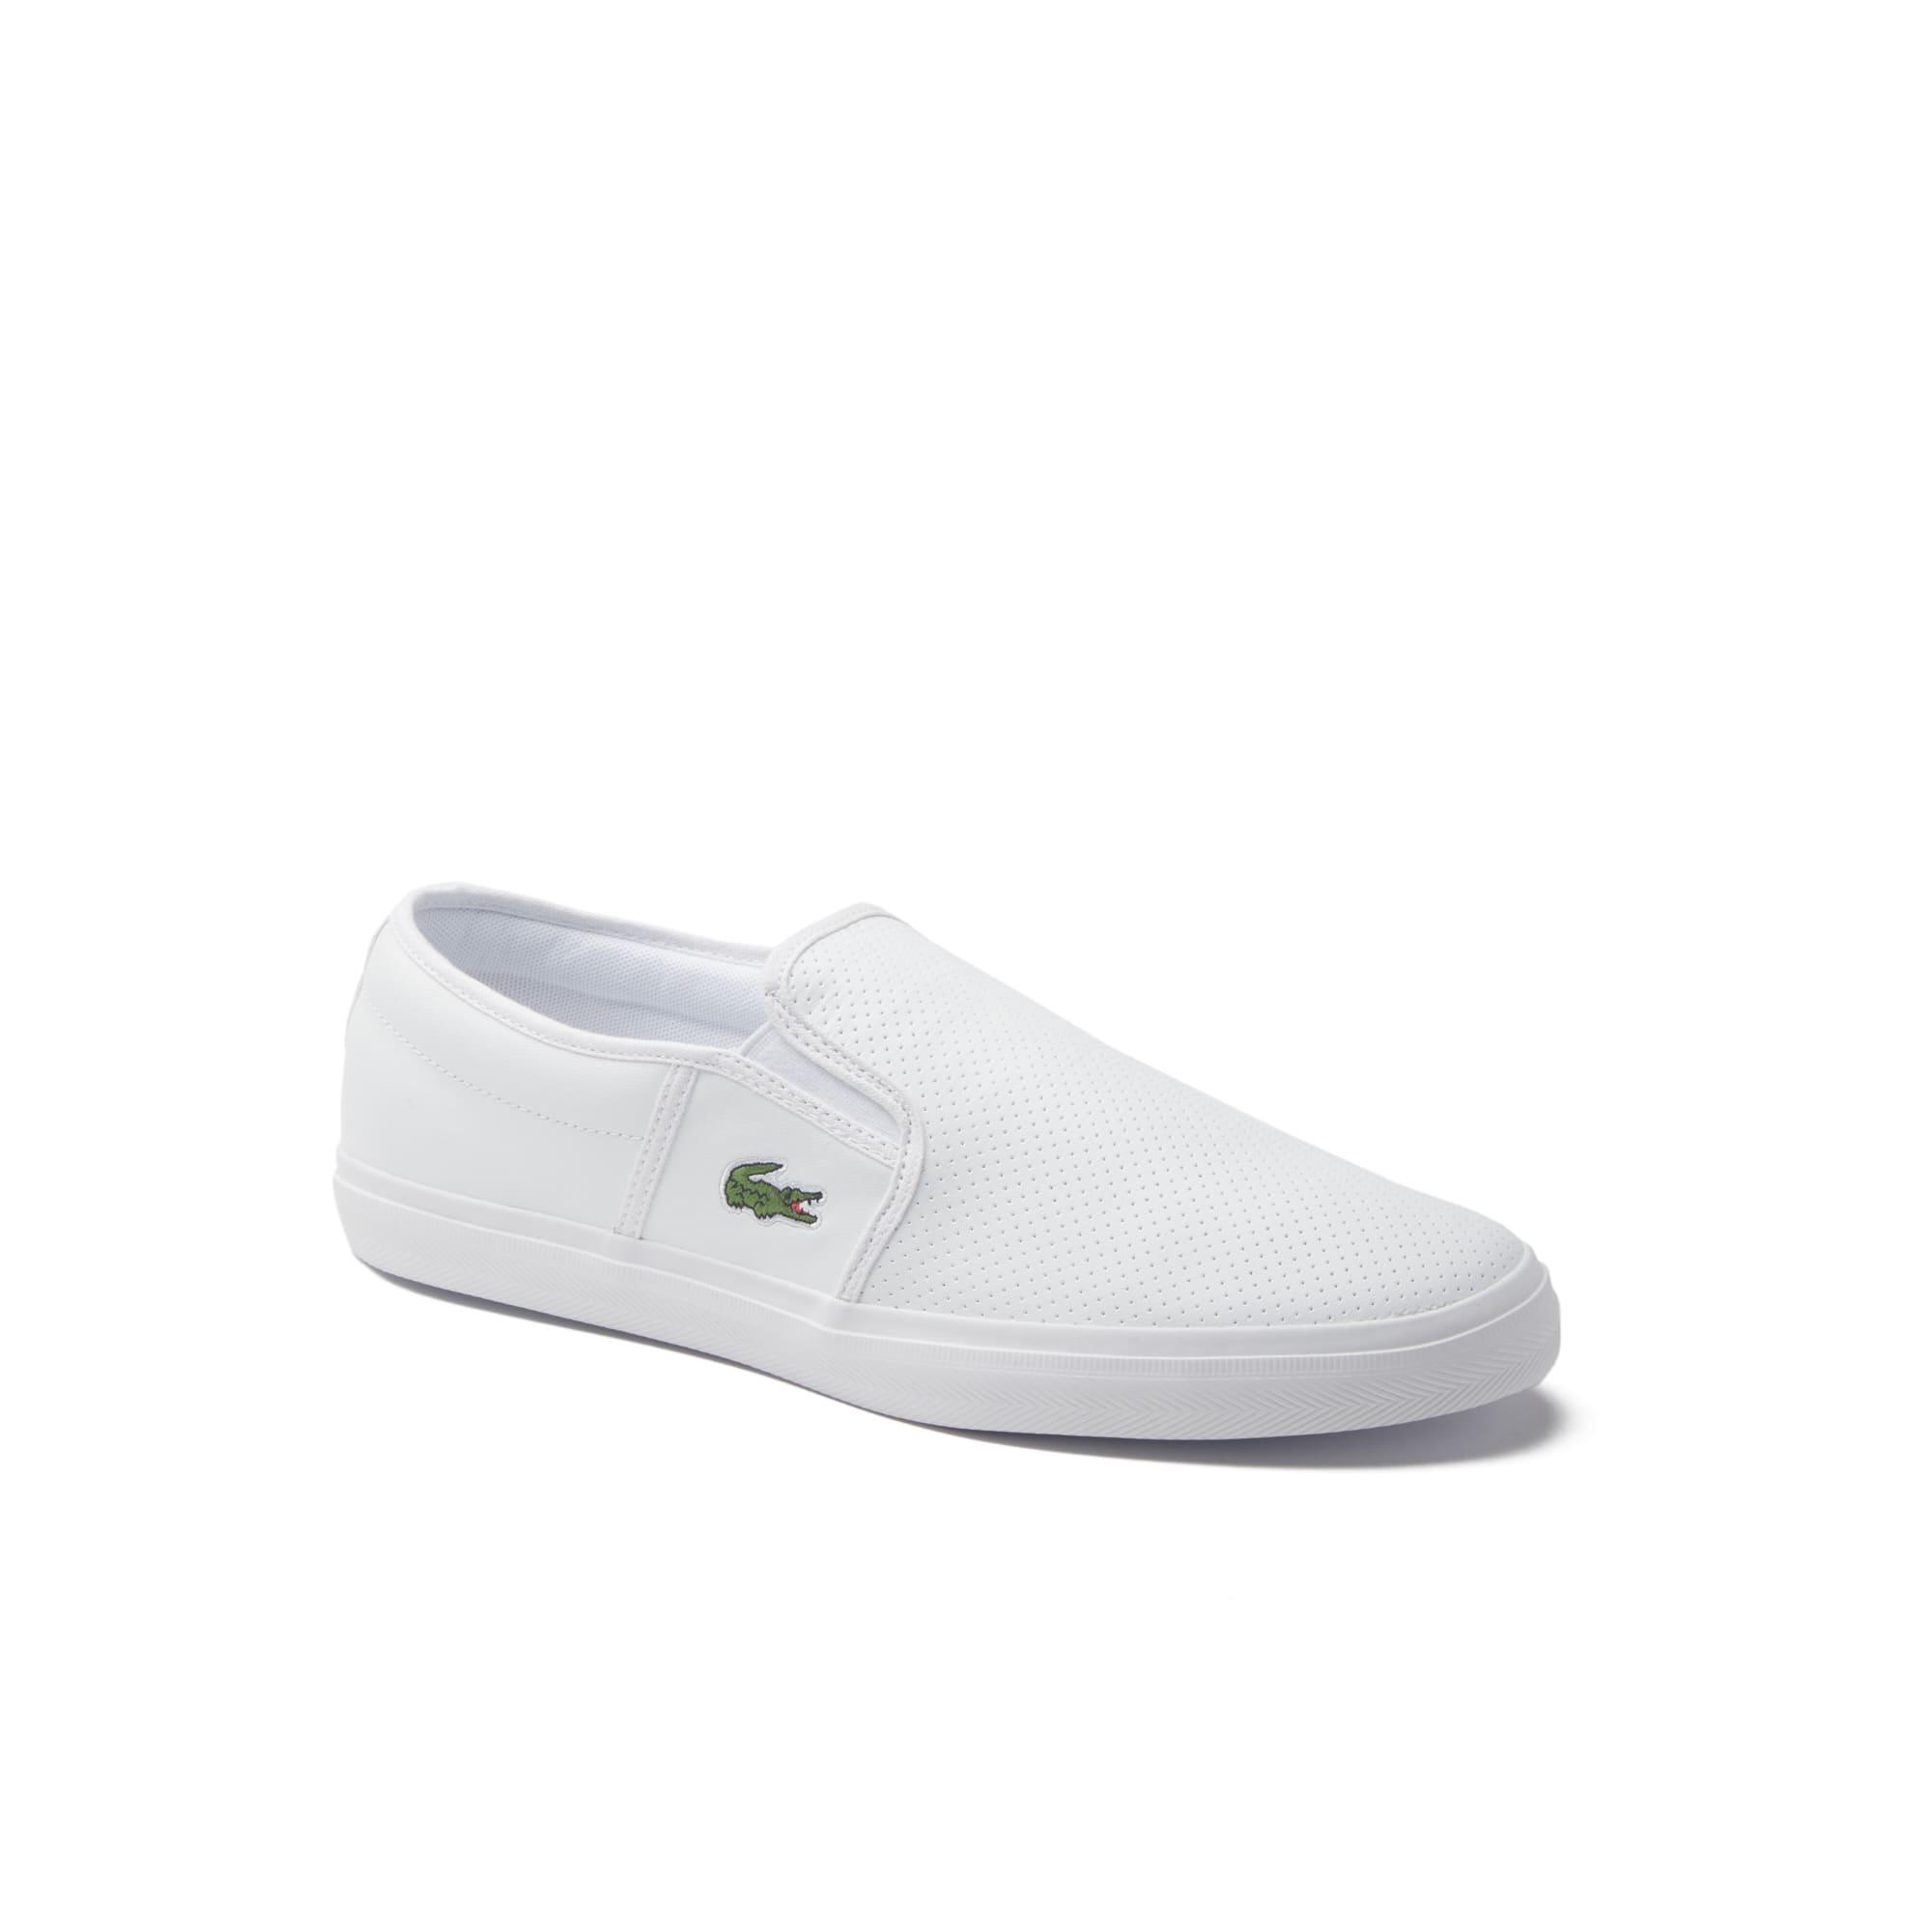 Men's Gazon BL Leather Slip-ons